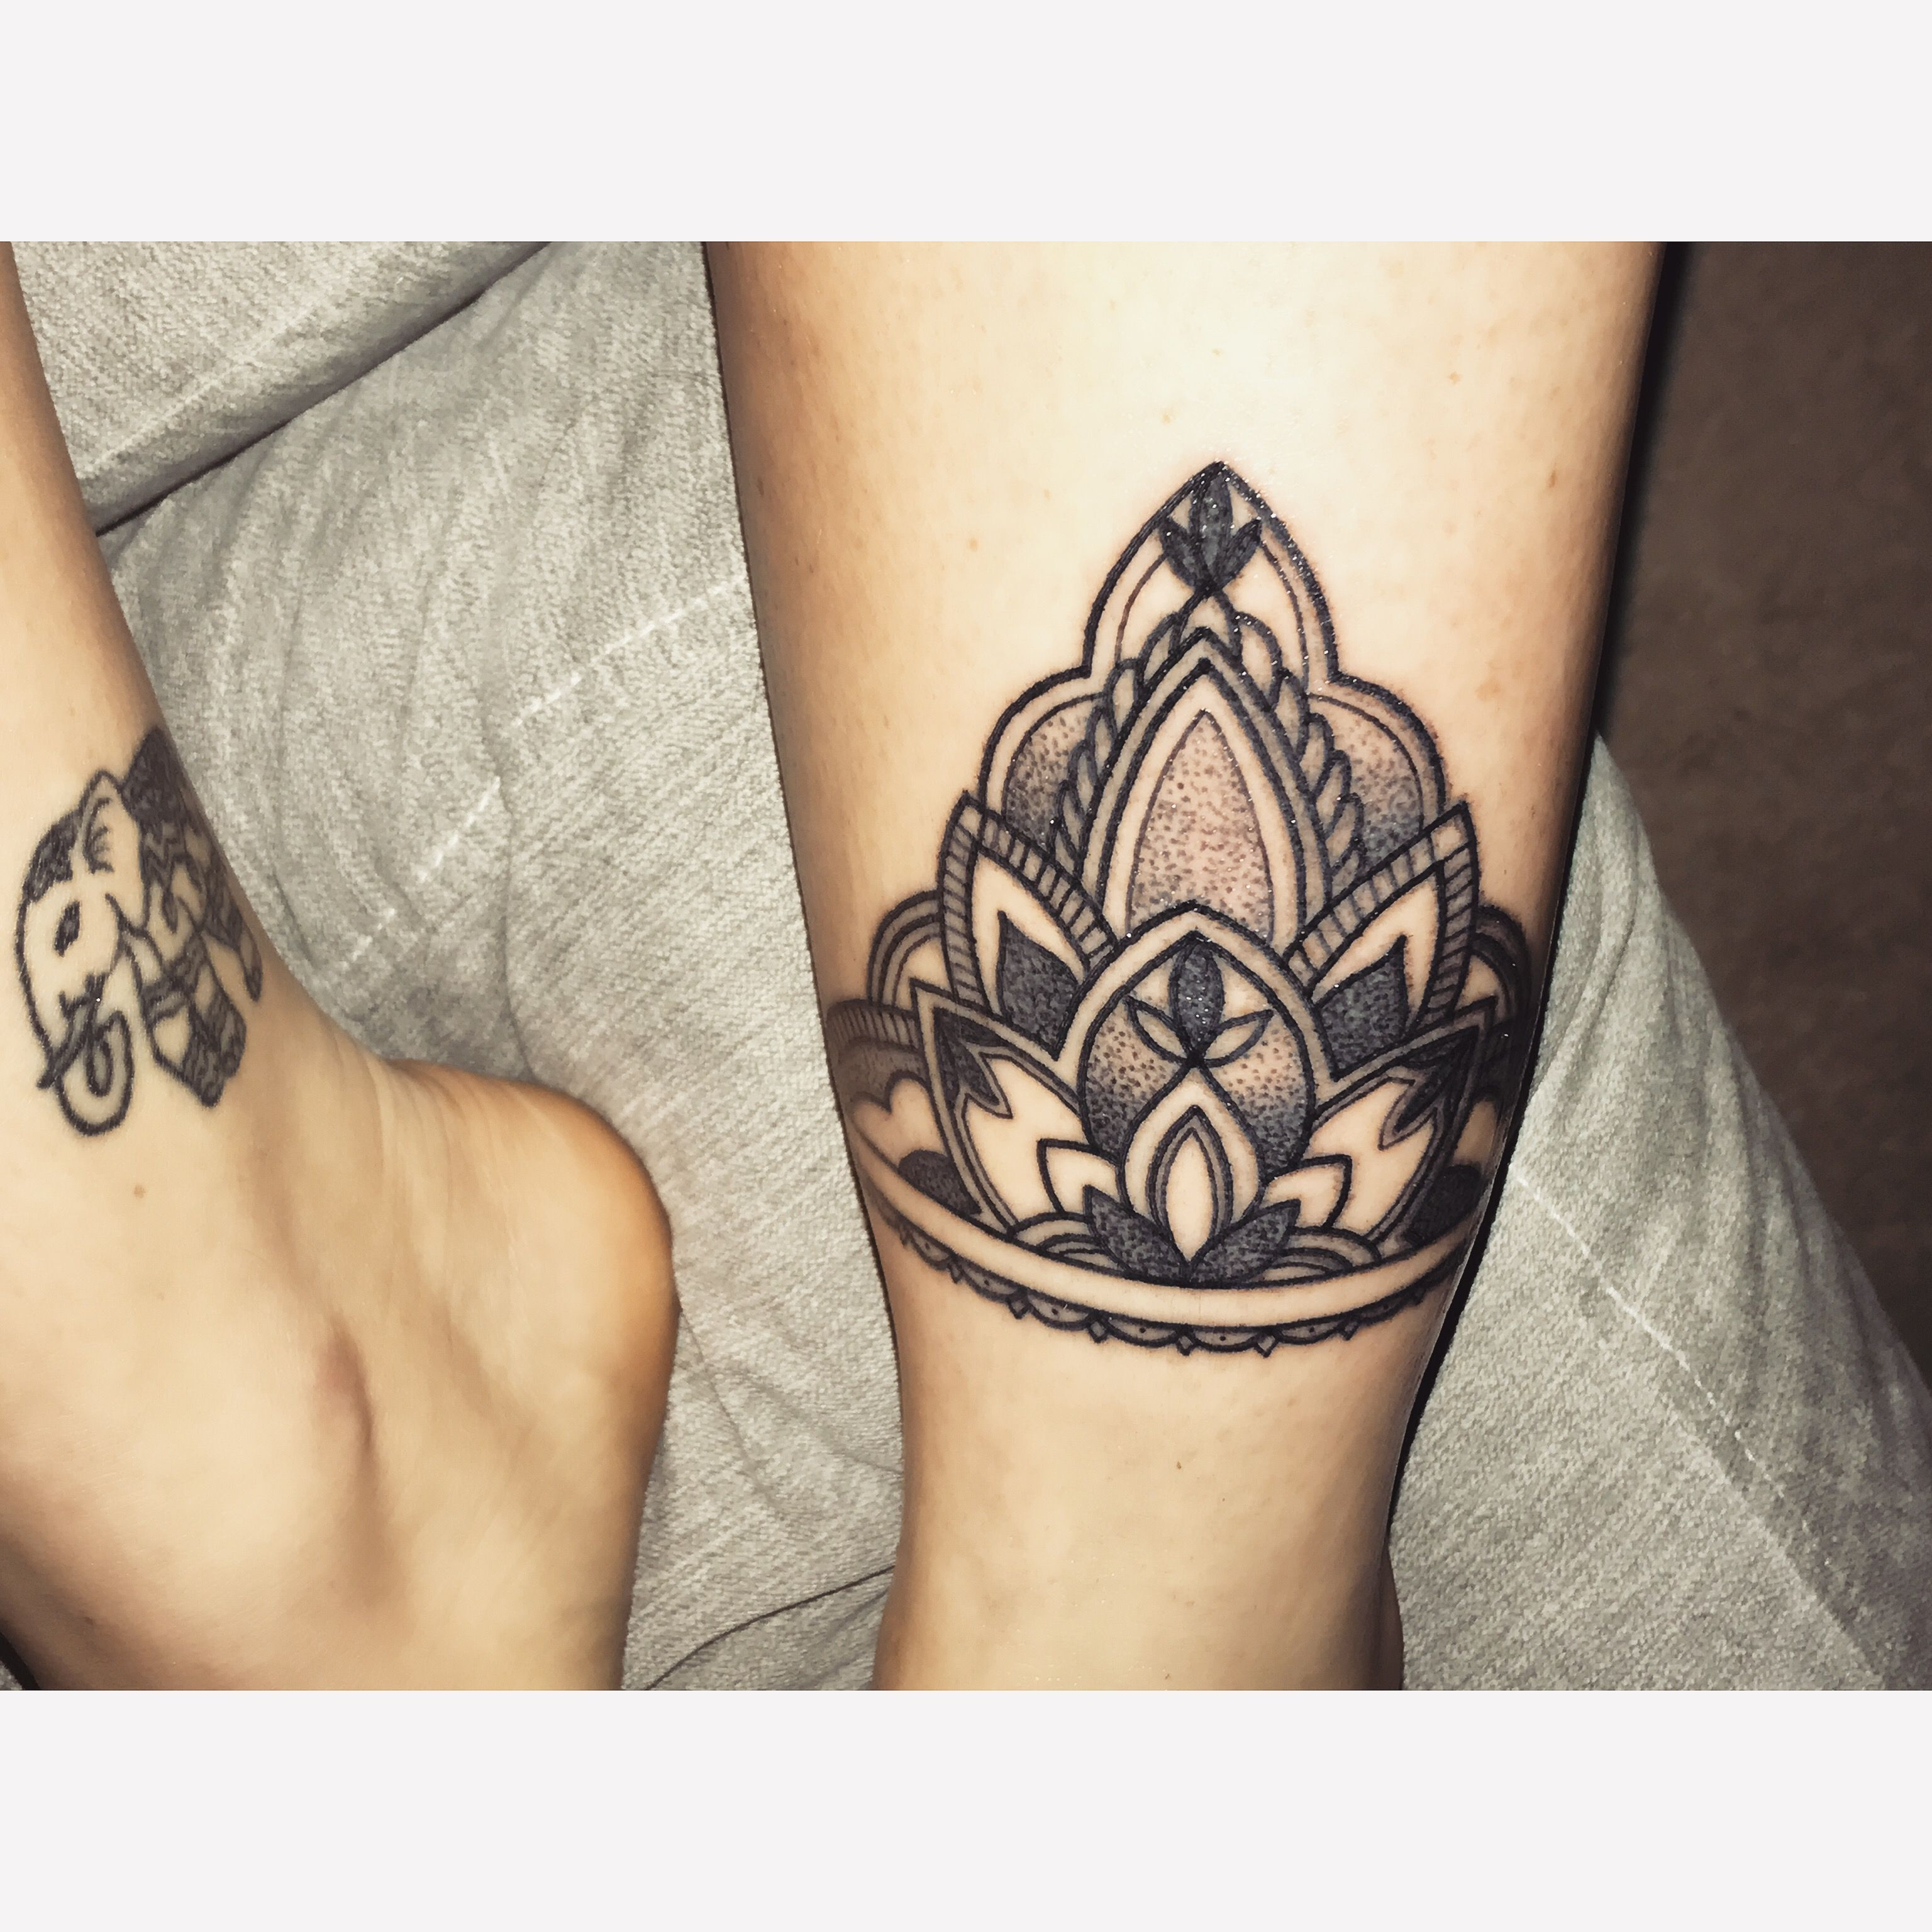 bedff47b9 Mandala ankle cuff done at Hammersmith tattoo by Alex ❤ #mandala #ankle # tattoo #dotwork